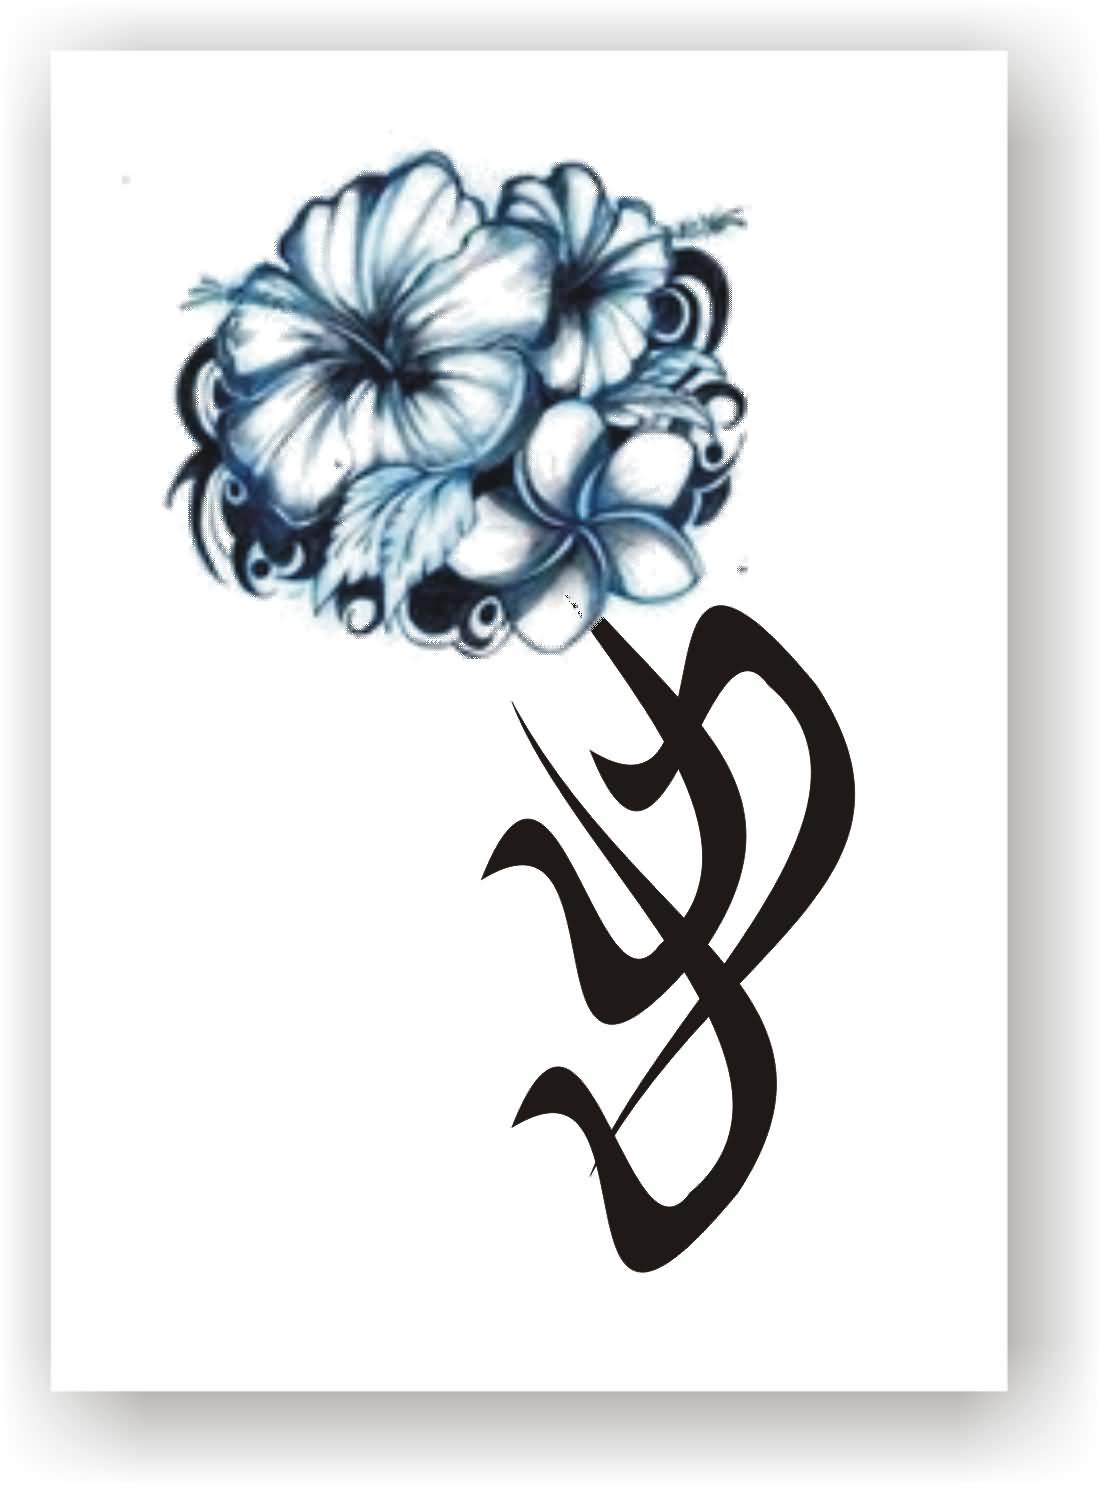 Hibiscus Flower Tattoo Stencil: Hibiscus Tattoo Images & Designs